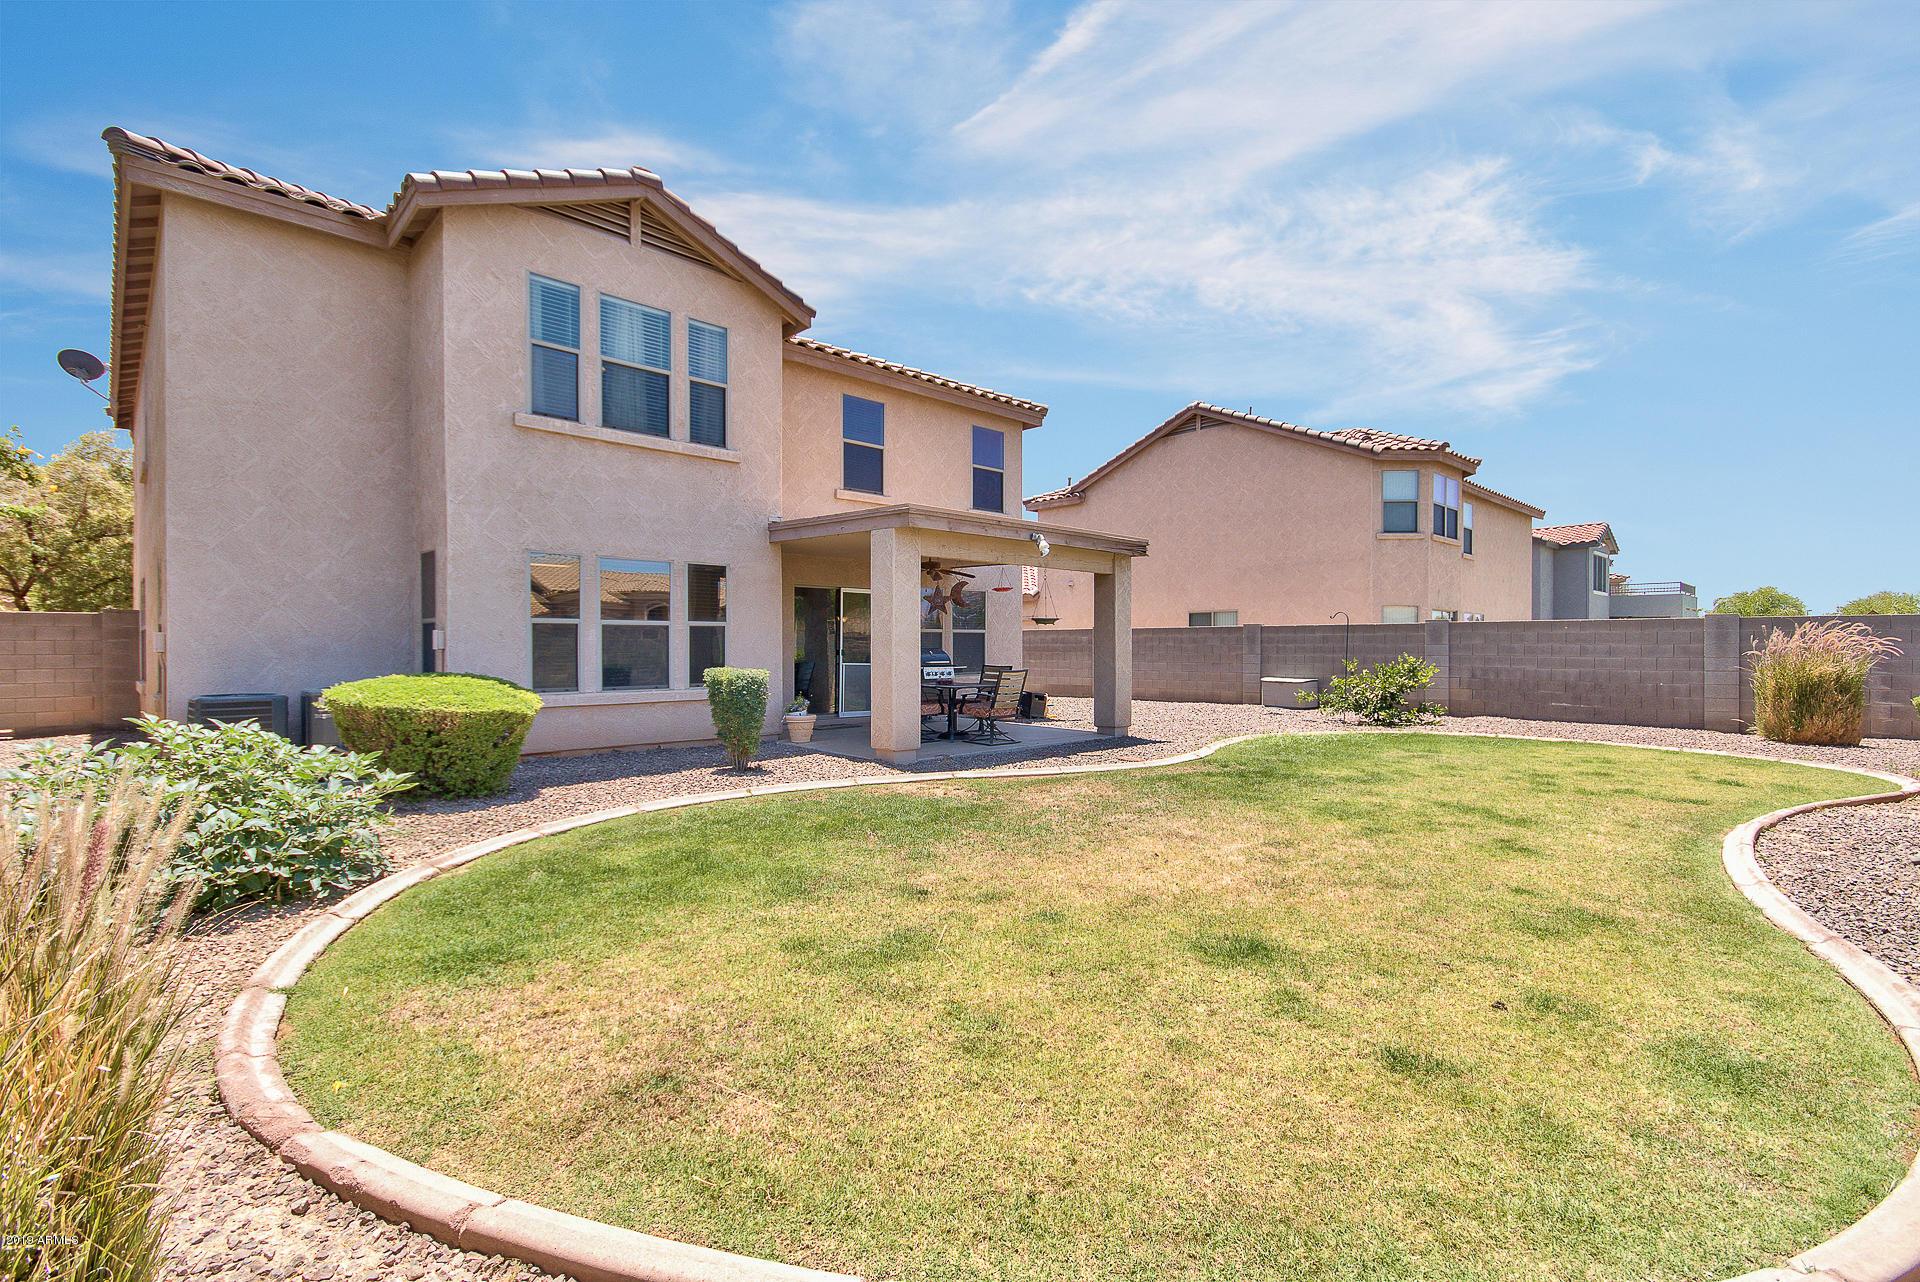 MLS 5942395 3508 E CLAXTON Avenue, Gilbert, AZ 85297 Gilbert AZ San Tan Ranch